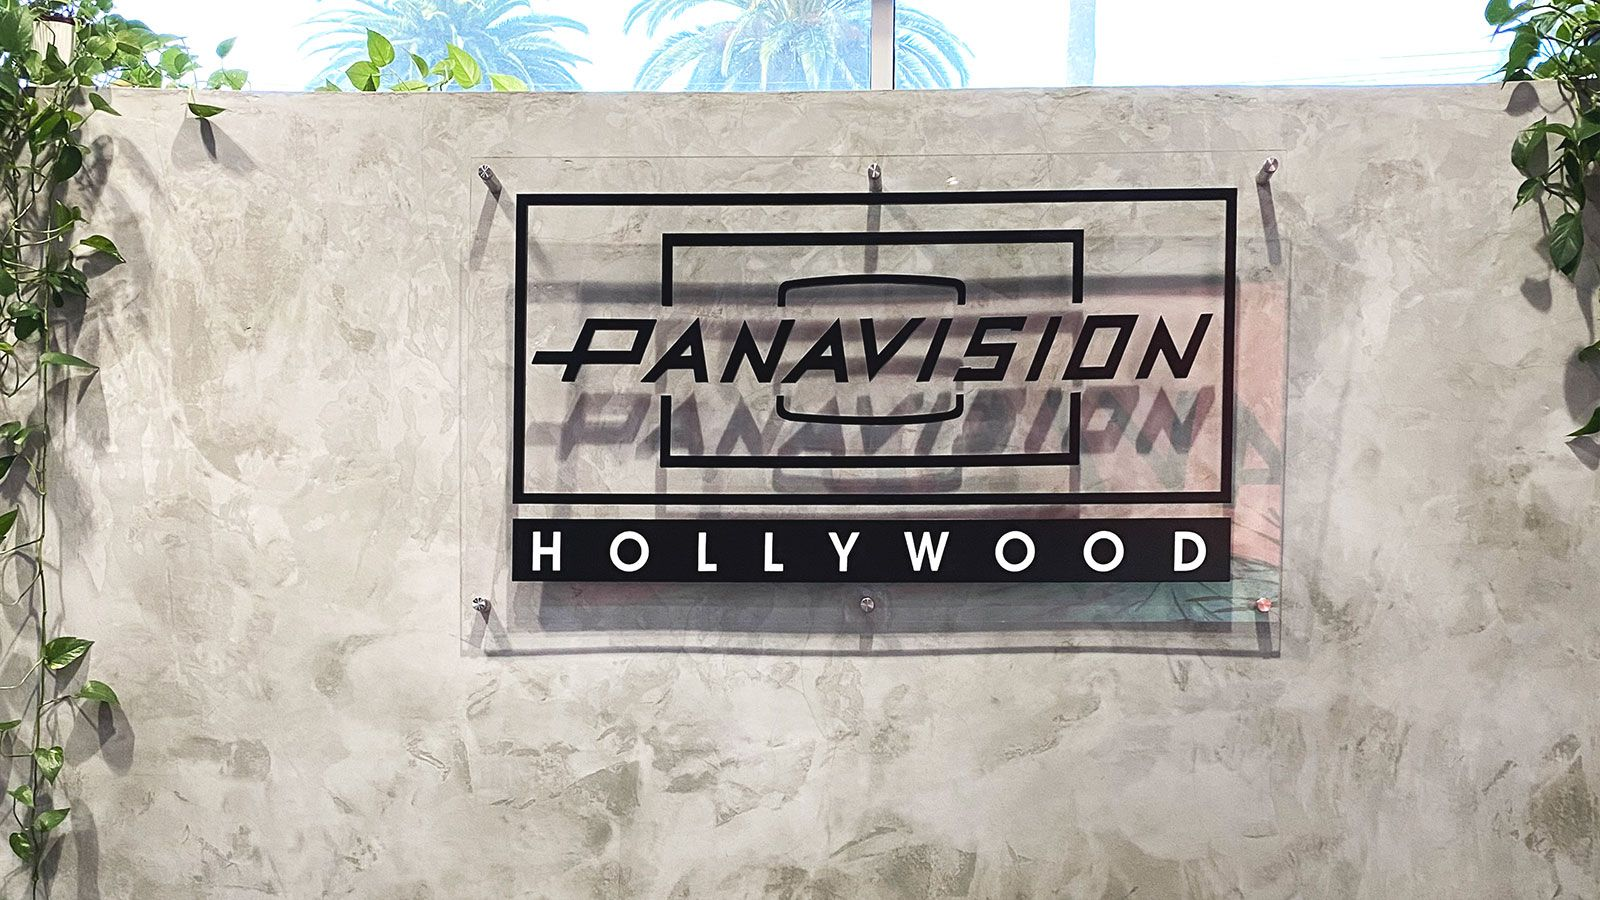 panavision hollywood office acrylic sign